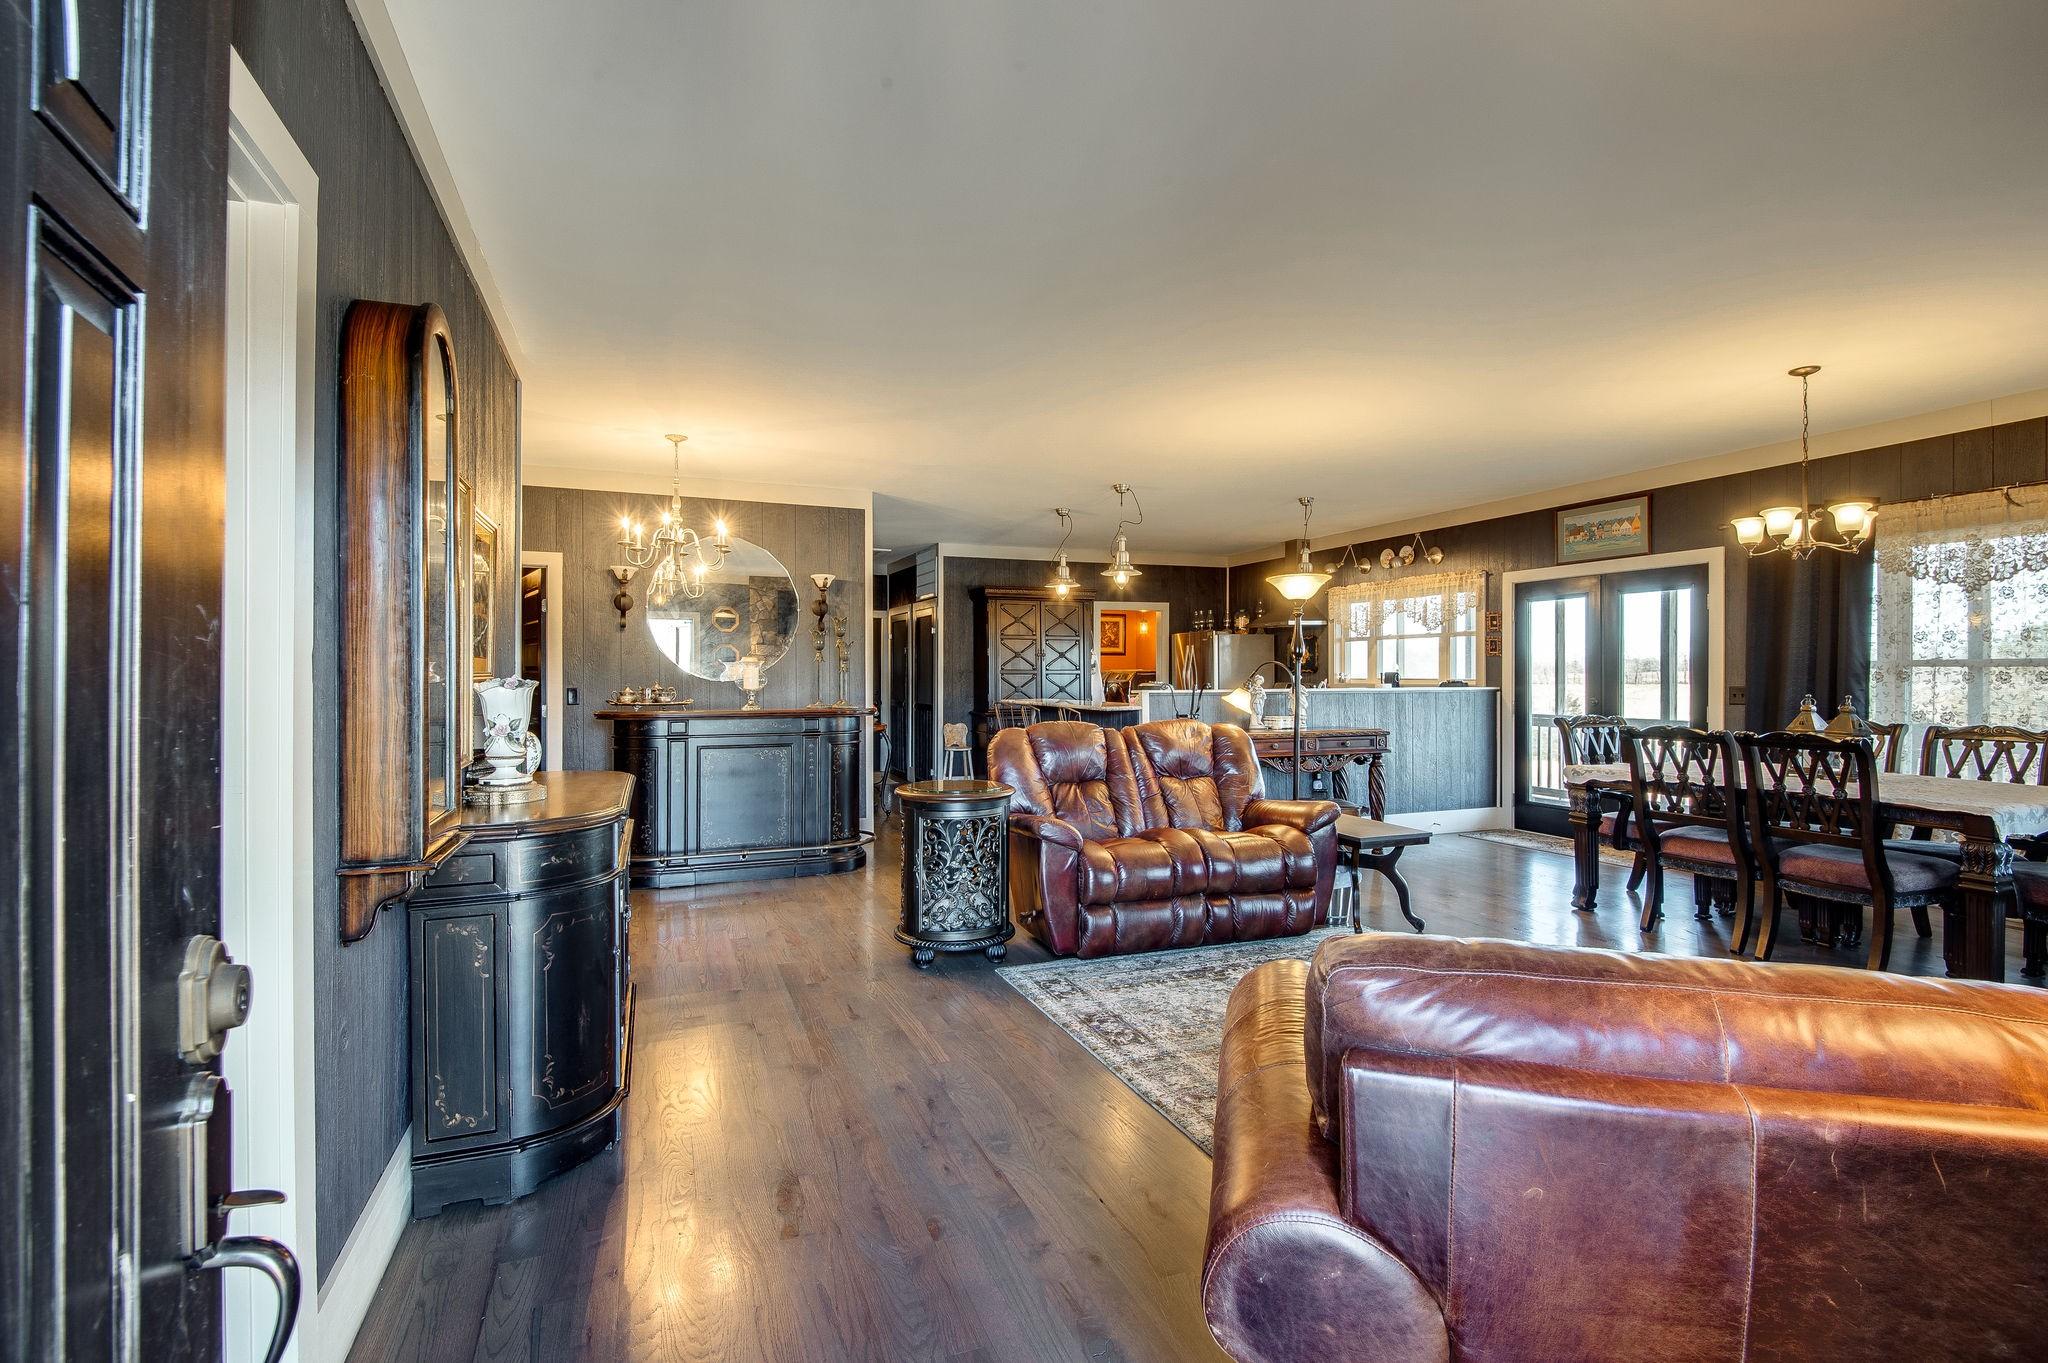 188 W Piney Rd, Dickson, TN 37055 - Dickson, TN real estate listing